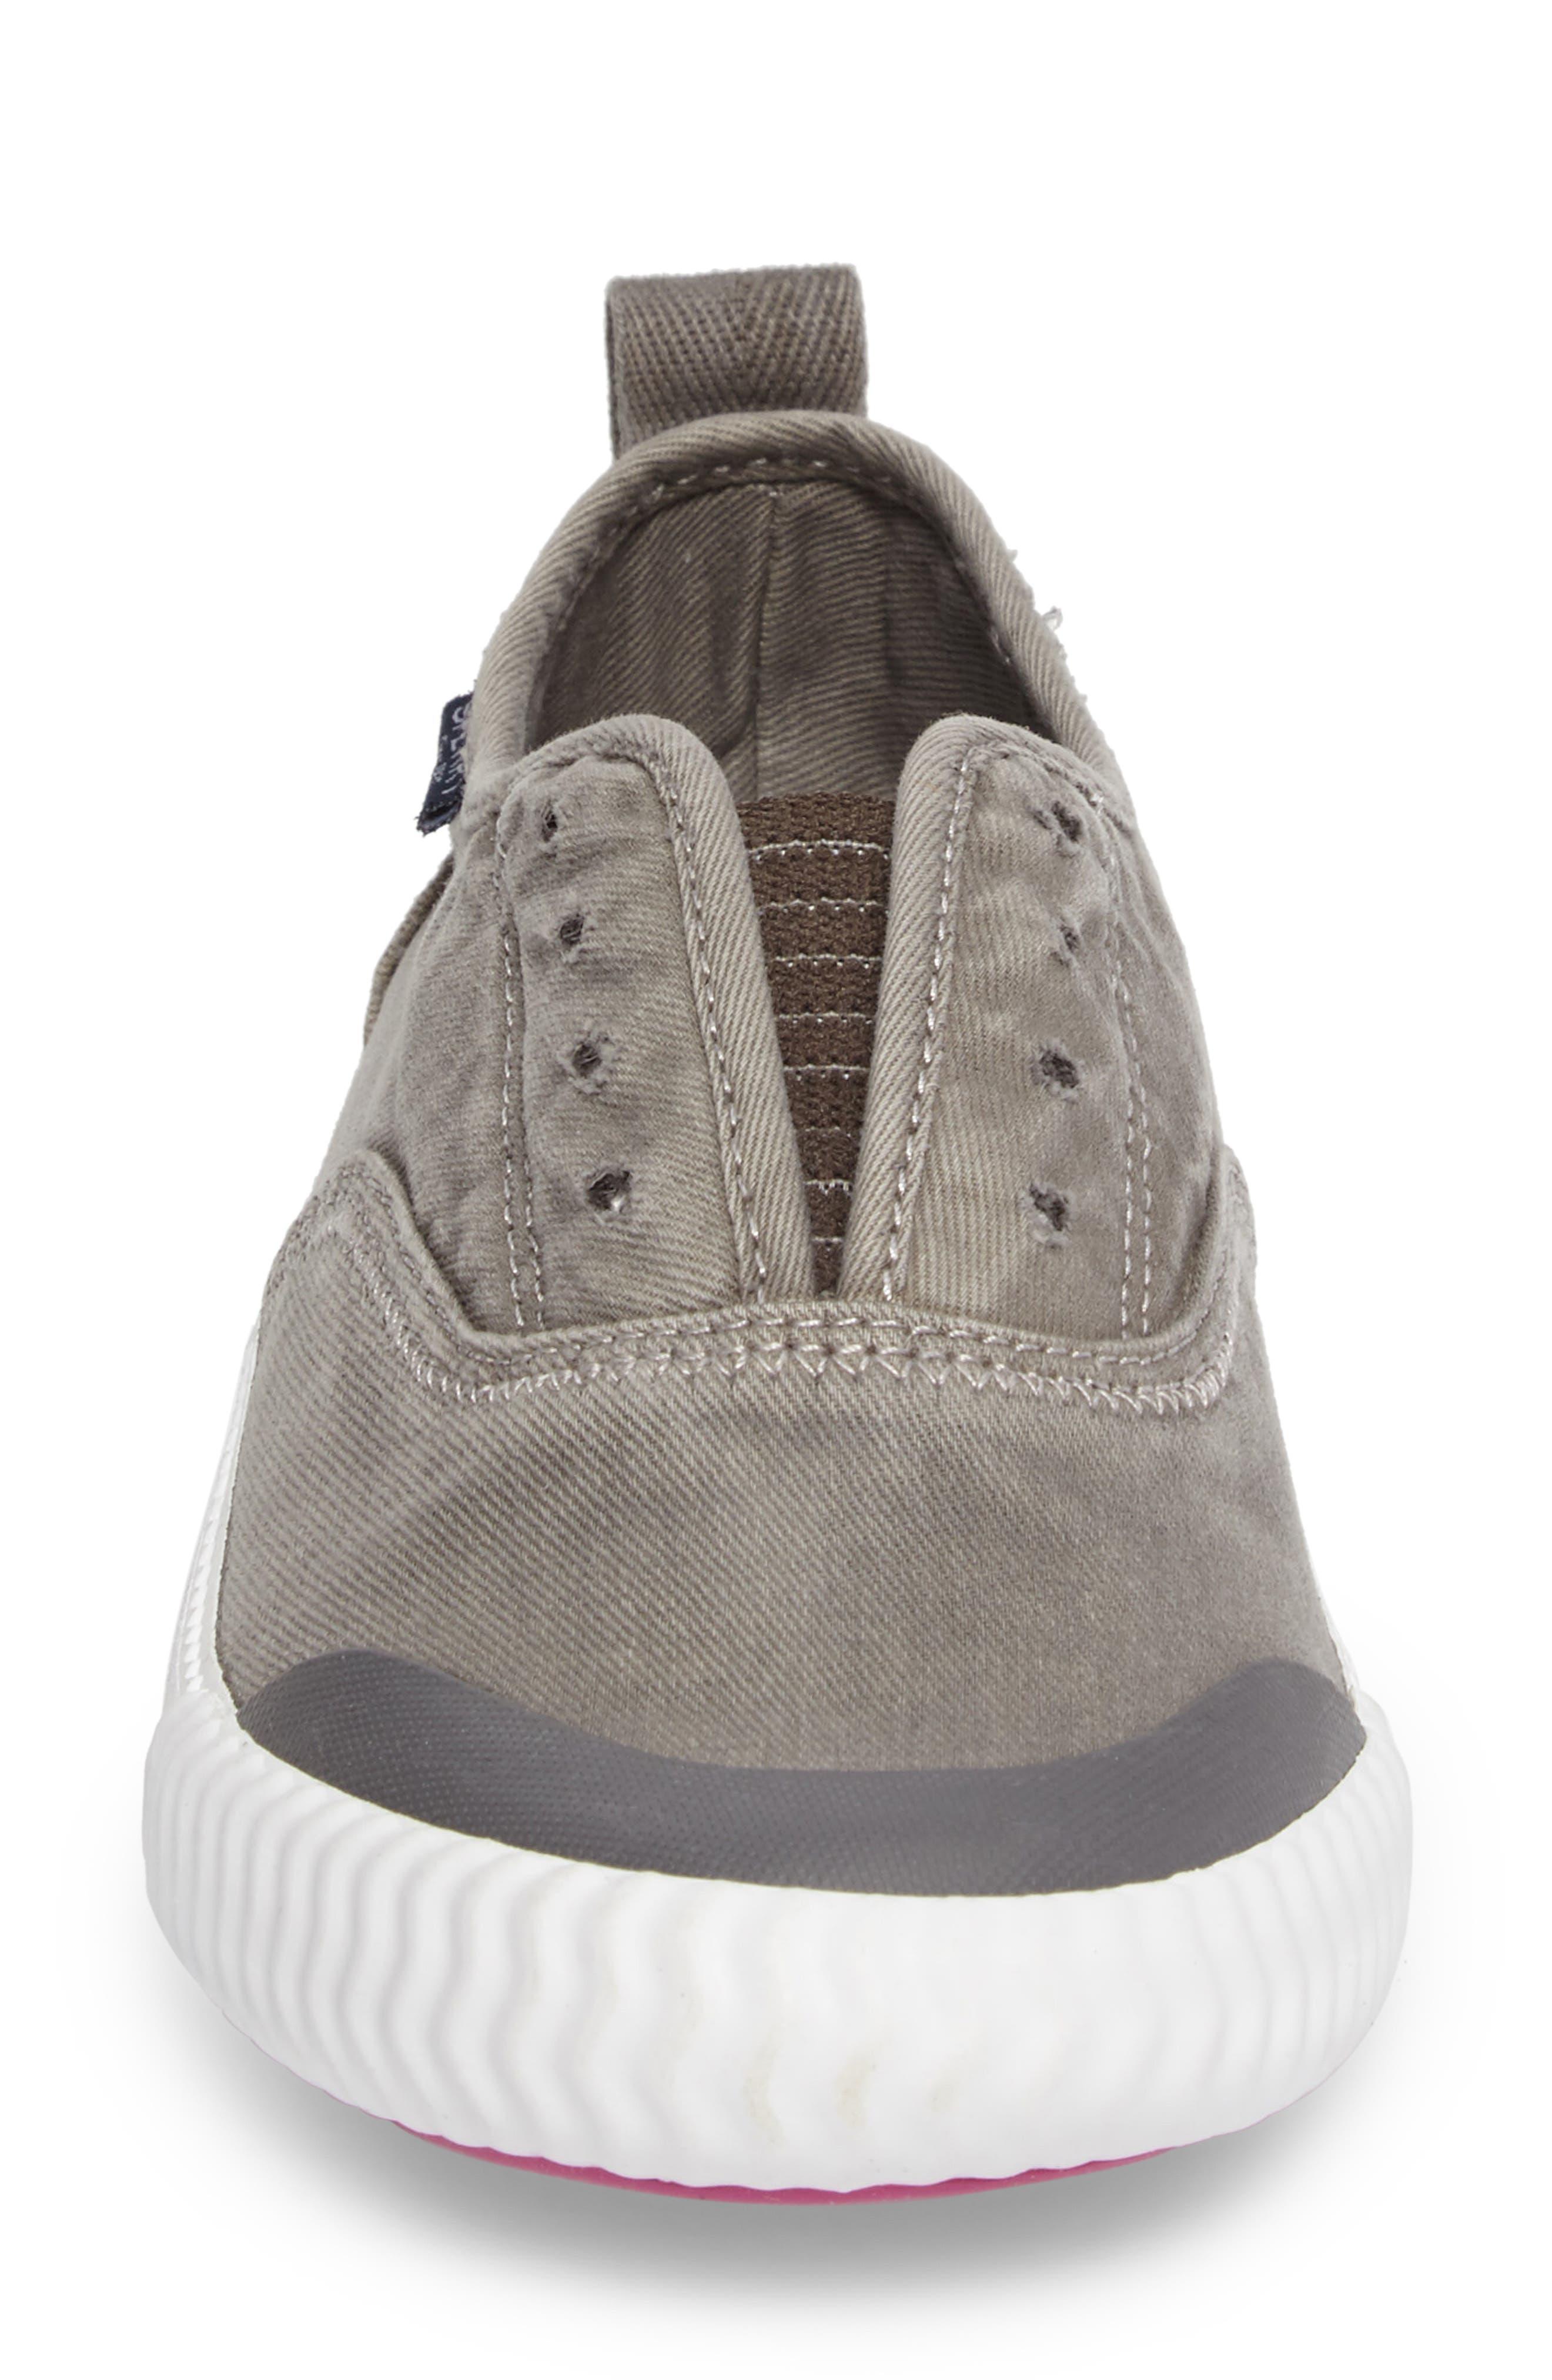 Sayel Slip-On Sneaker,                             Alternate thumbnail 4, color,                             GREY FABRIC